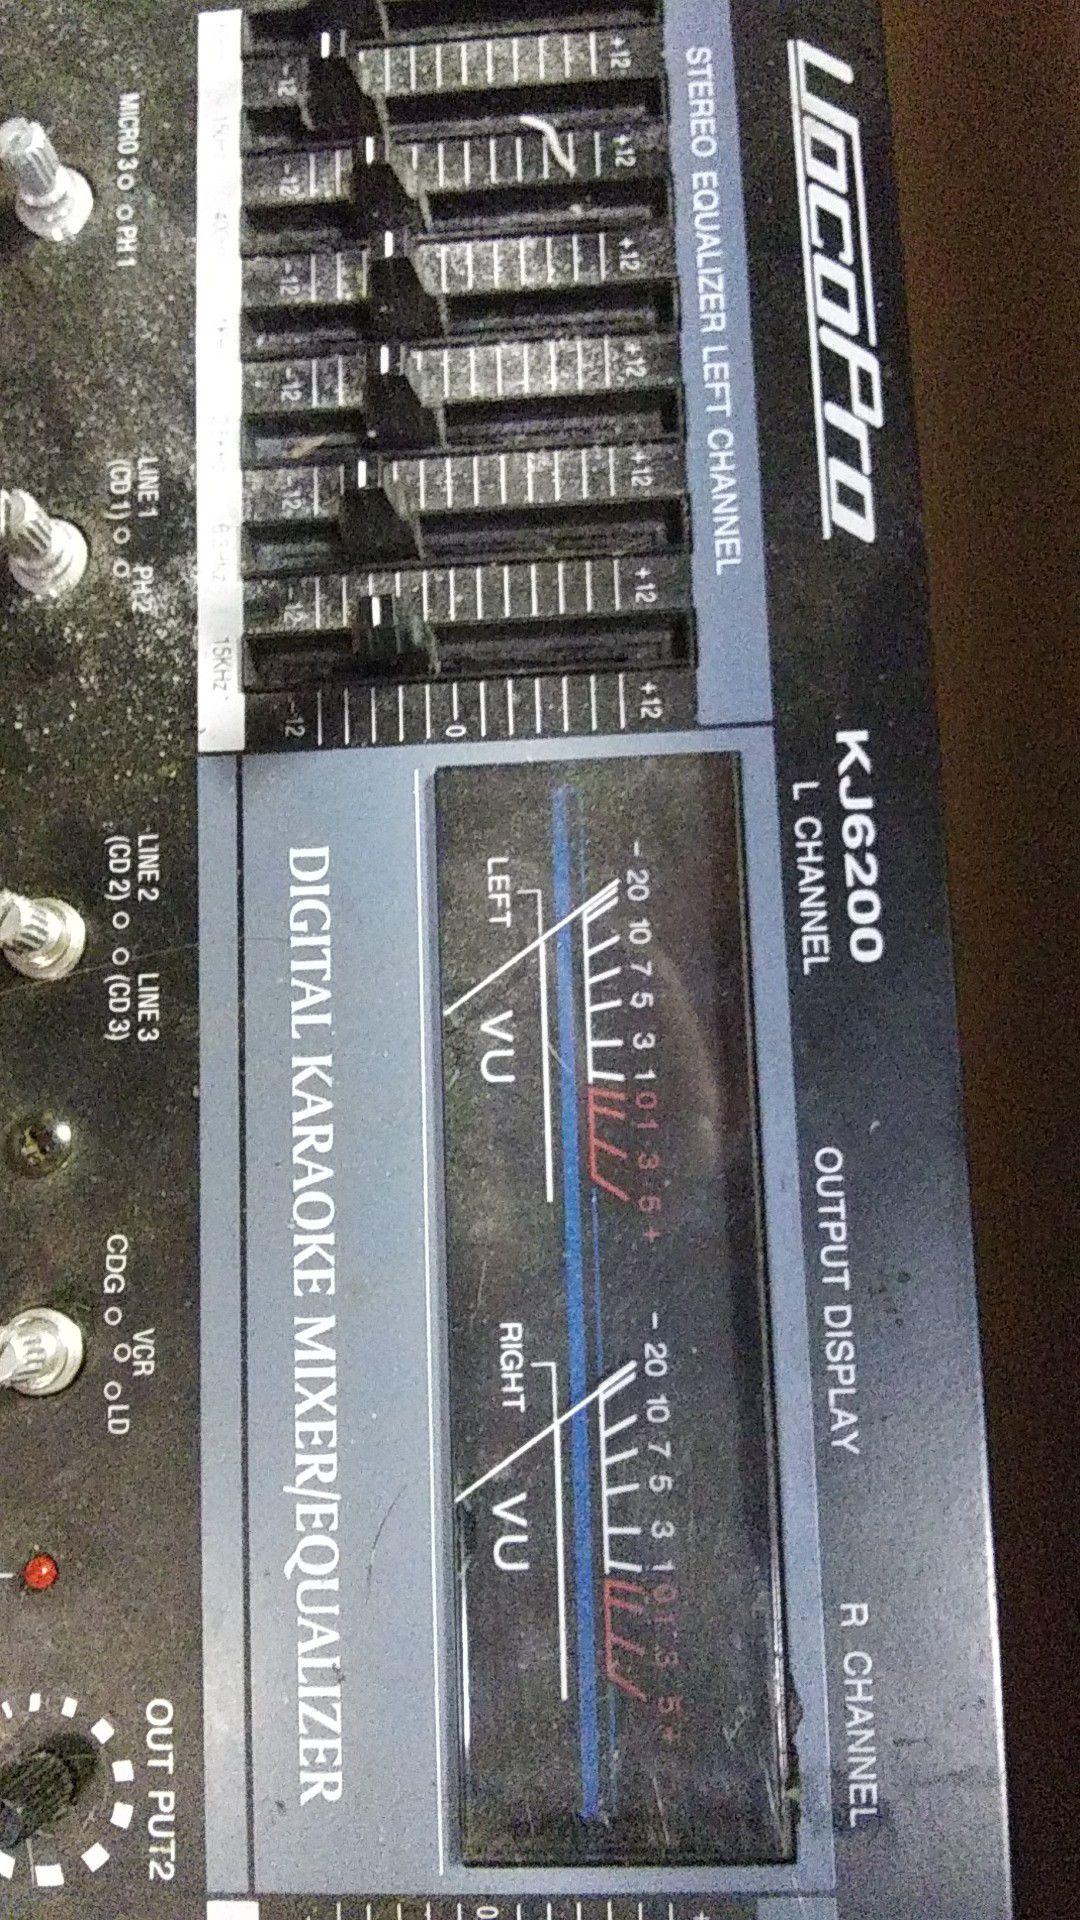 Vocopro digital karaoke mixer/EQ